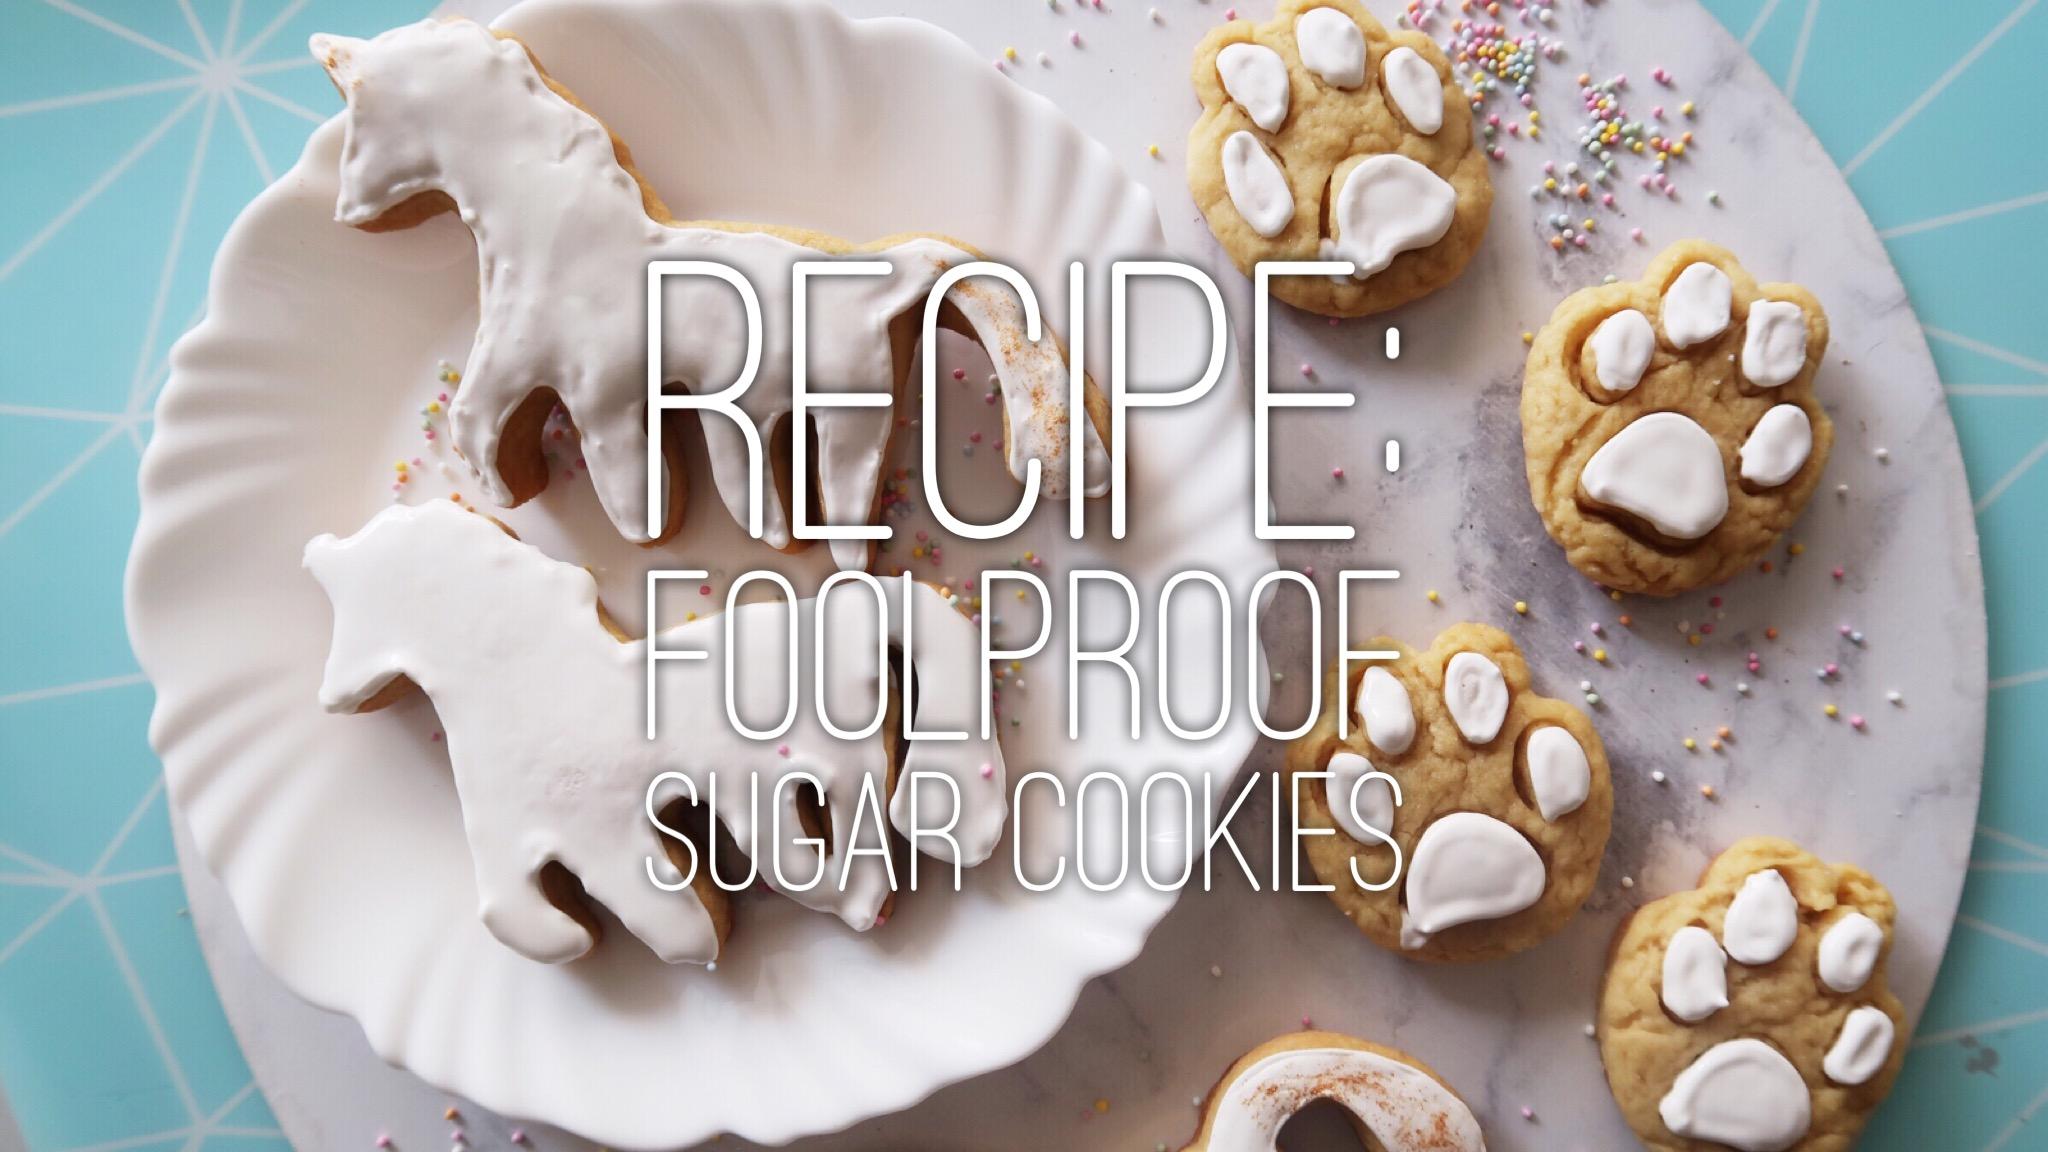 Recipe: Foolproof Sugar Cookies (unicorn-shaped!)